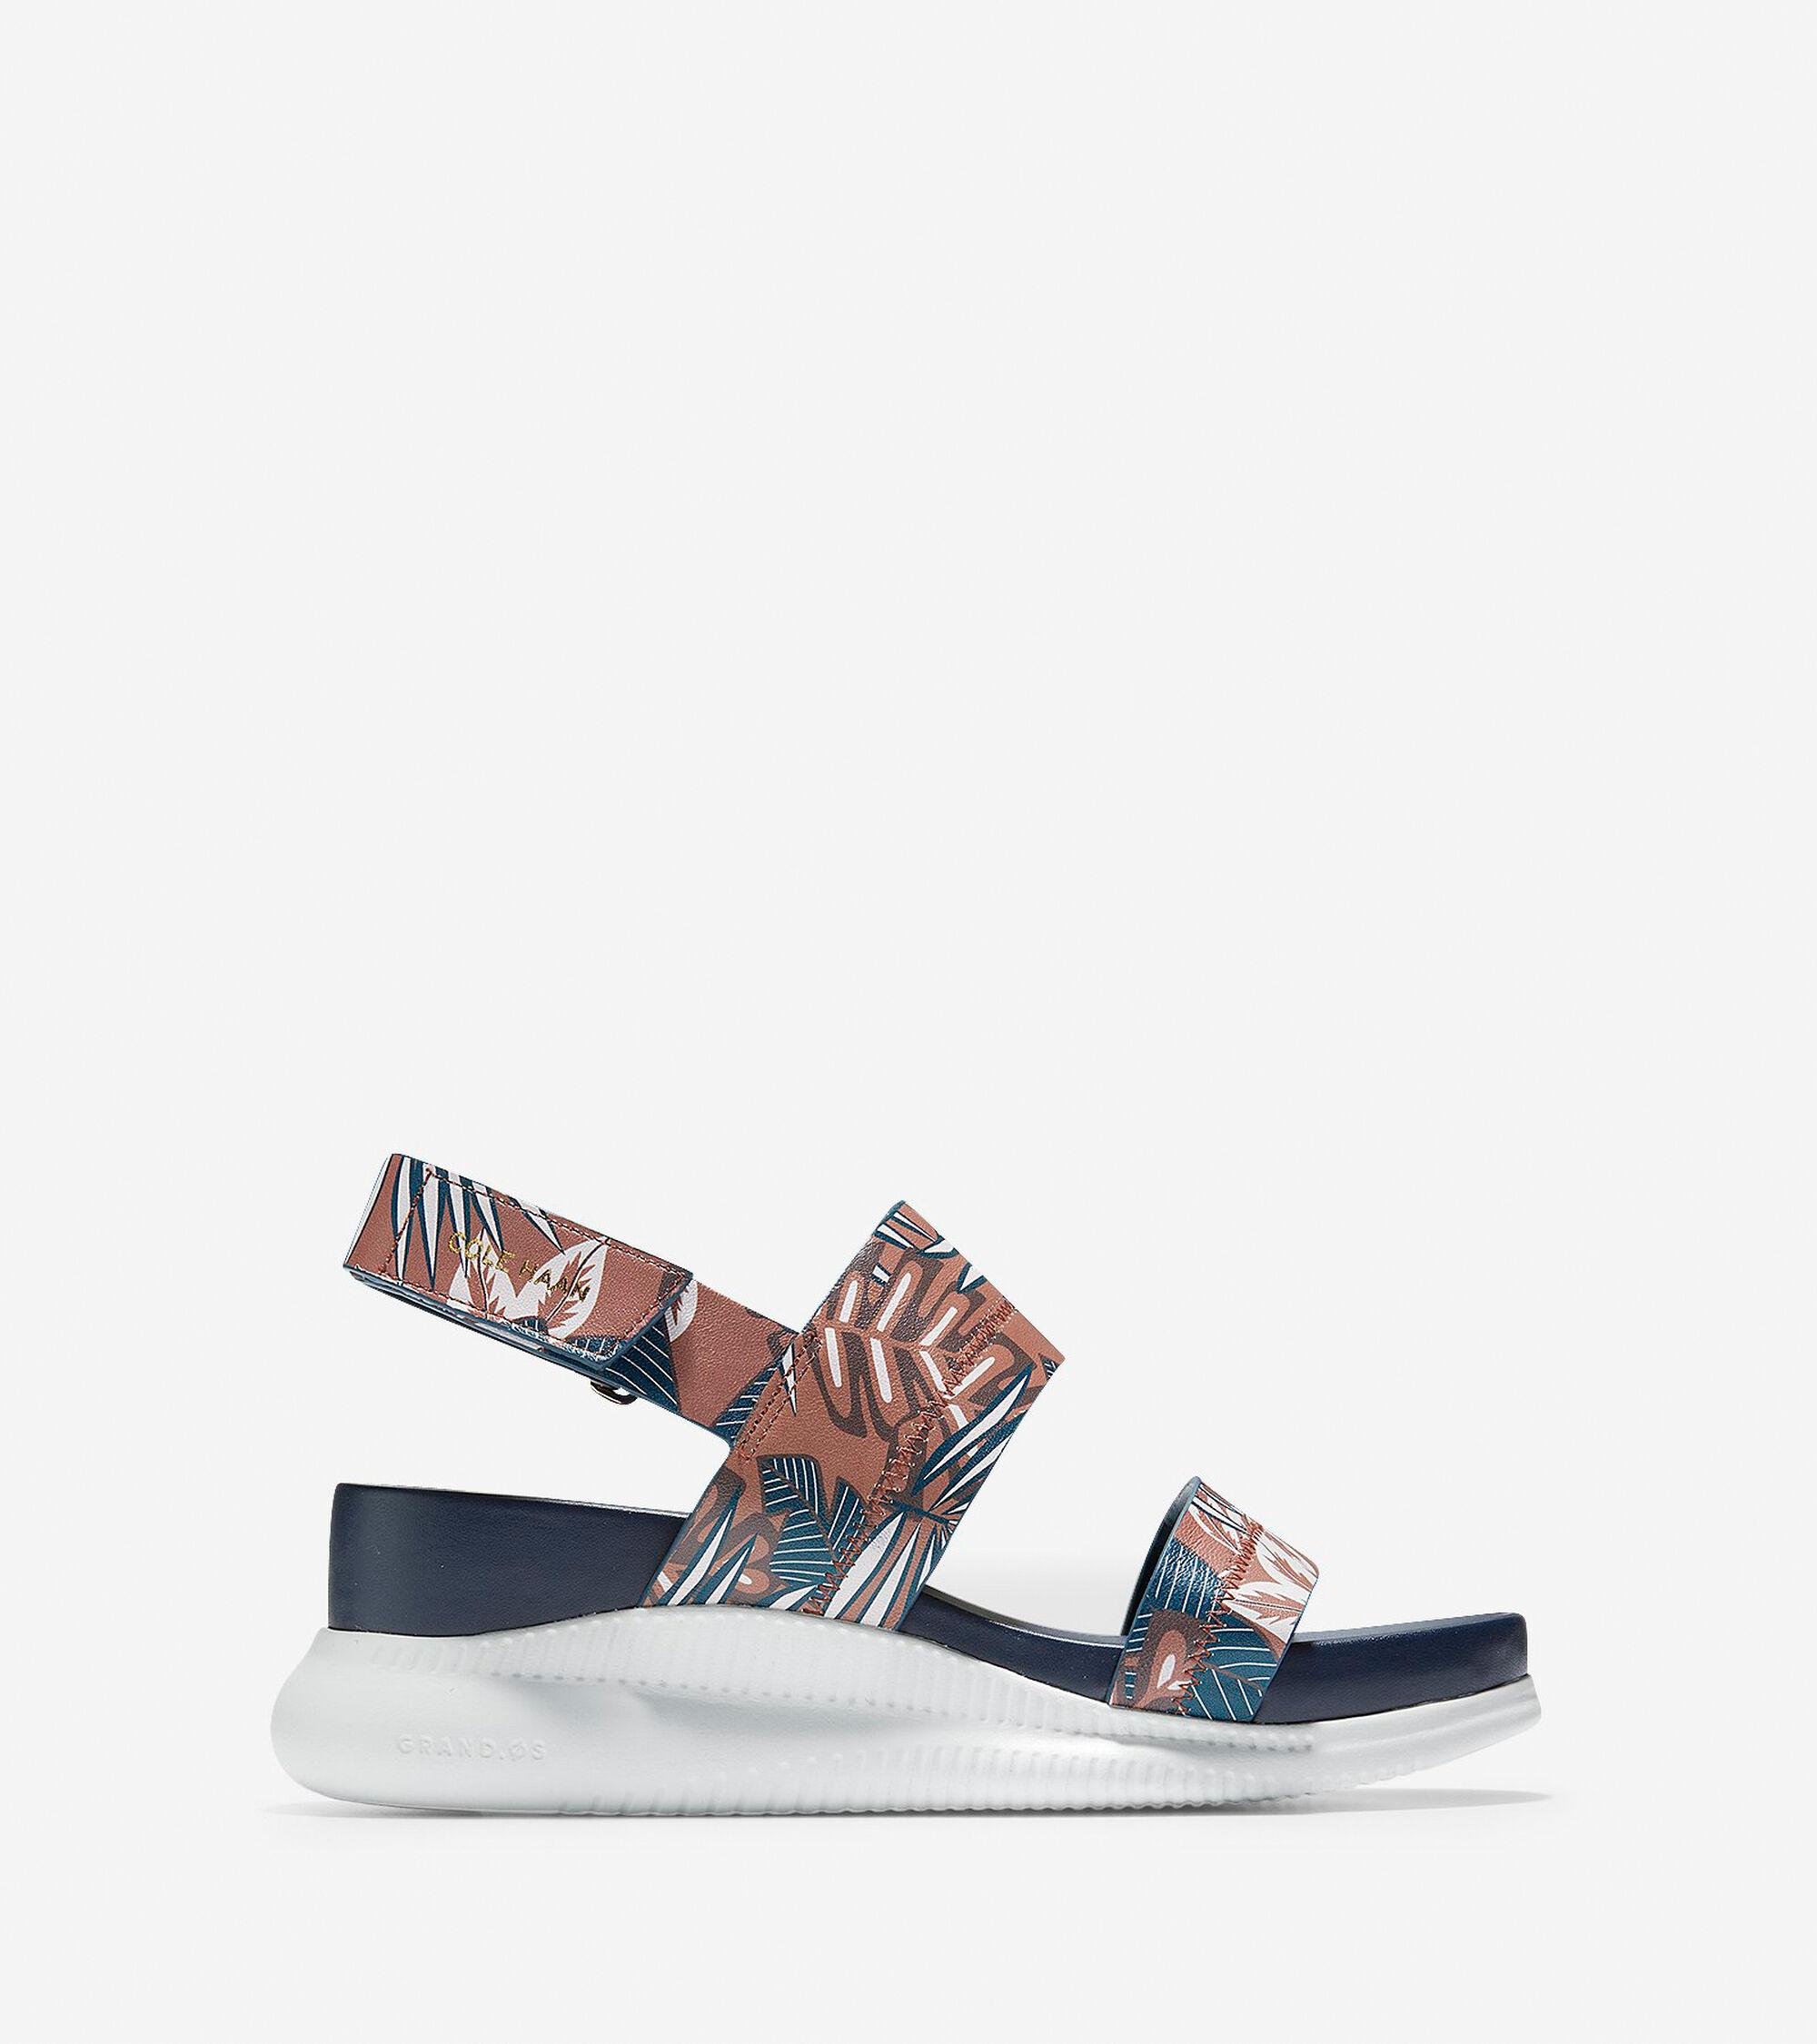 8216835623a Women s 2.ZEROGRAND Slide Sandals in Tropical Print